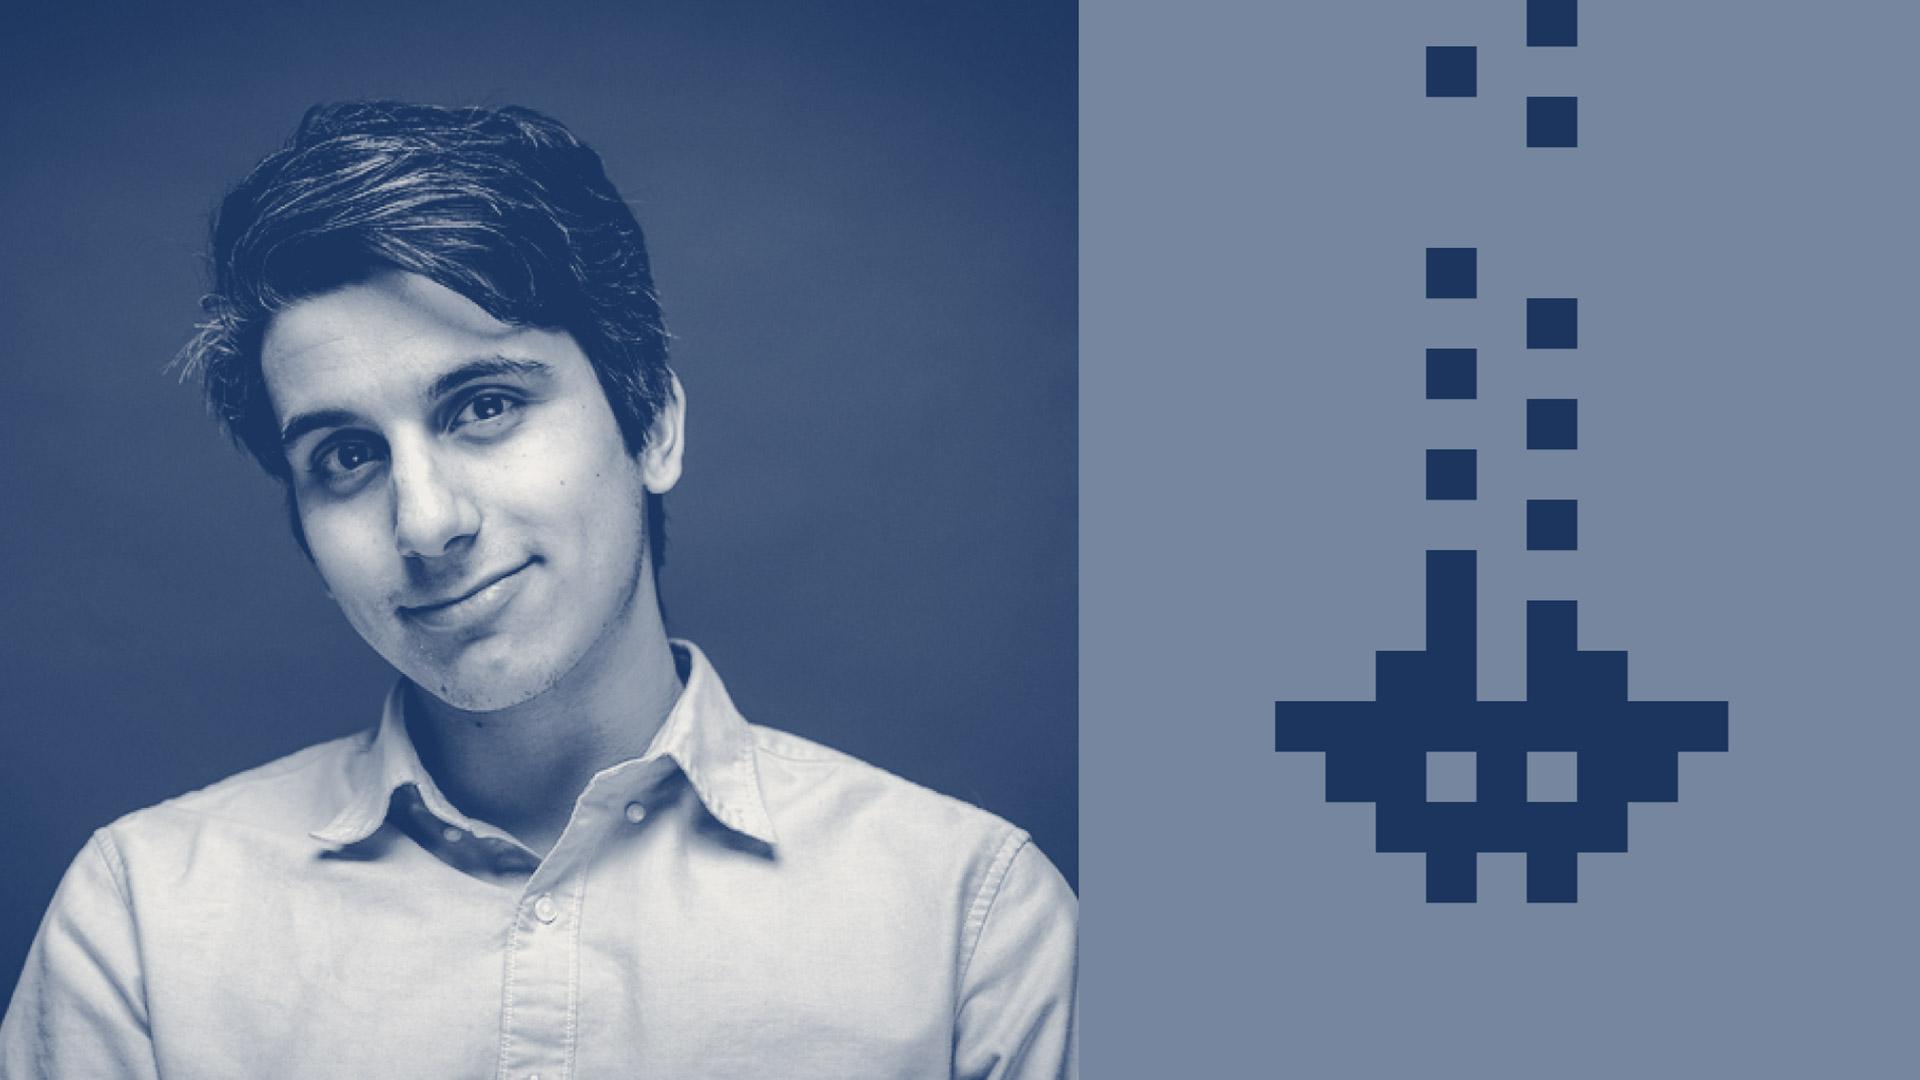 Meet gaming analytics pro (and self-avowed nongamer) Zach Kamran